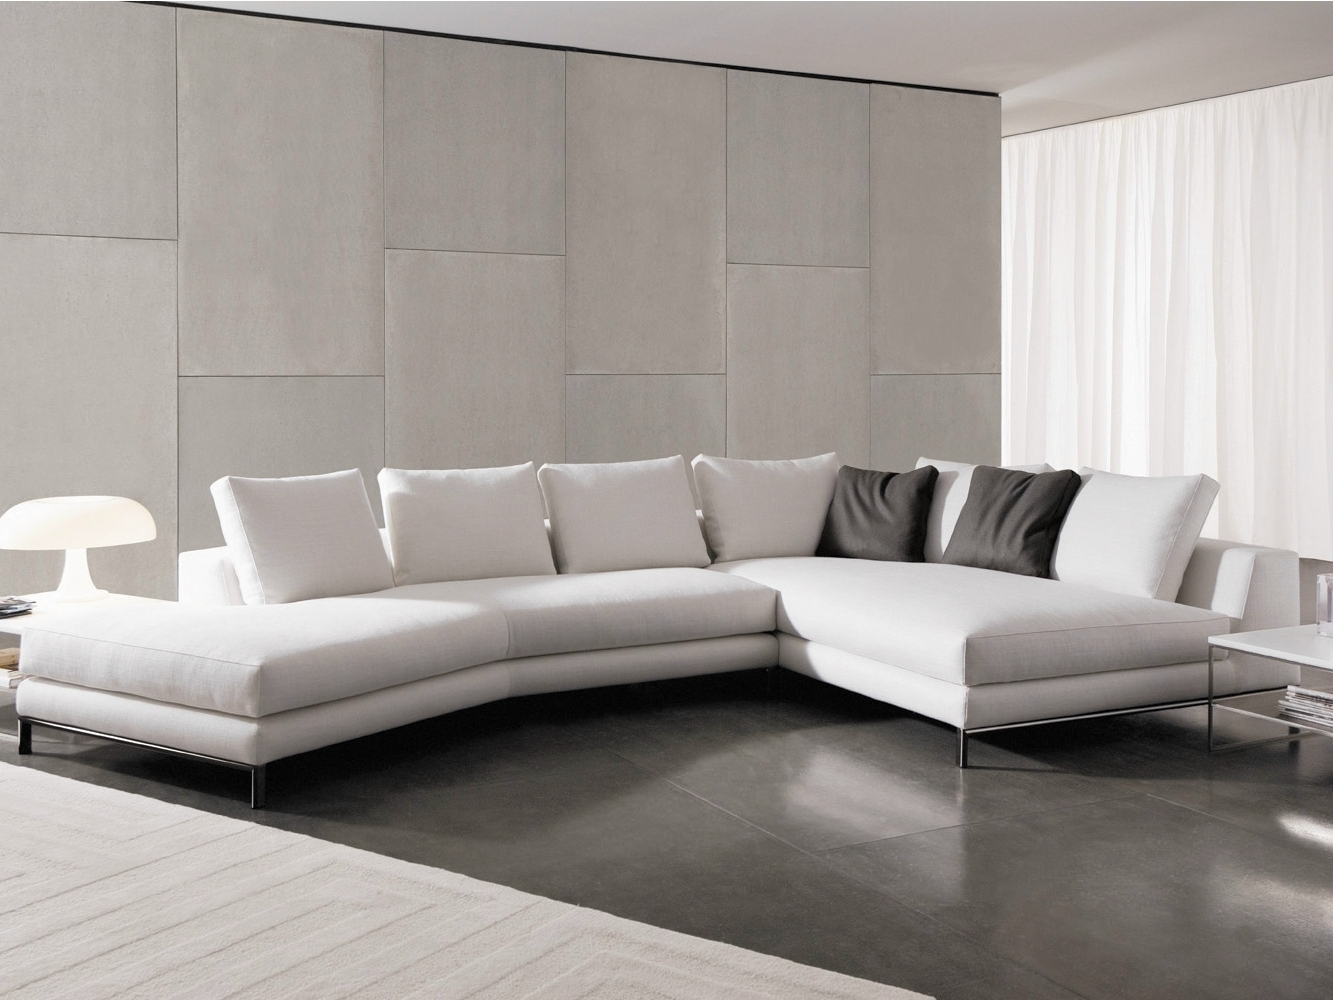 Latest Sectional Upholstered Fabric Sofa Hamilton Islands Hamilton Series Inside Hamilton Sectional Sofas (View 5 of 20)